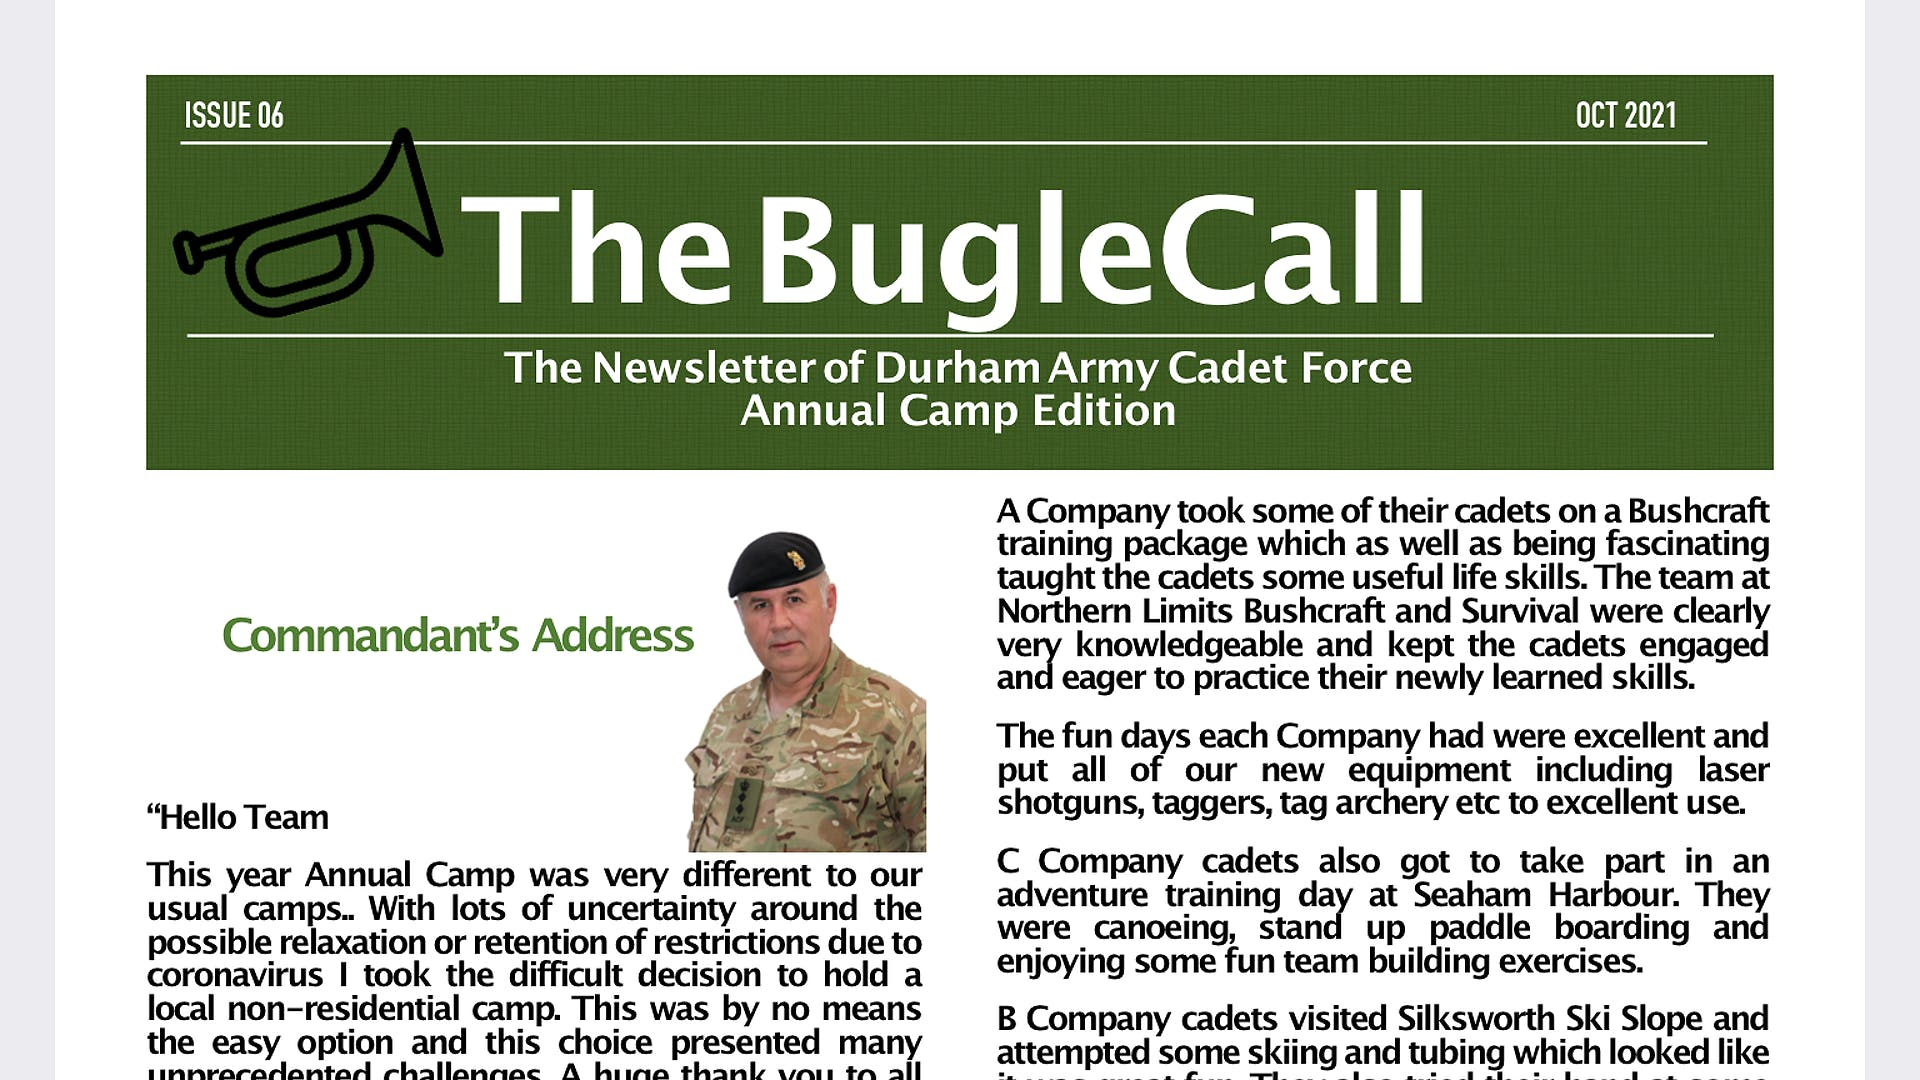 Bugle Call 06 Image